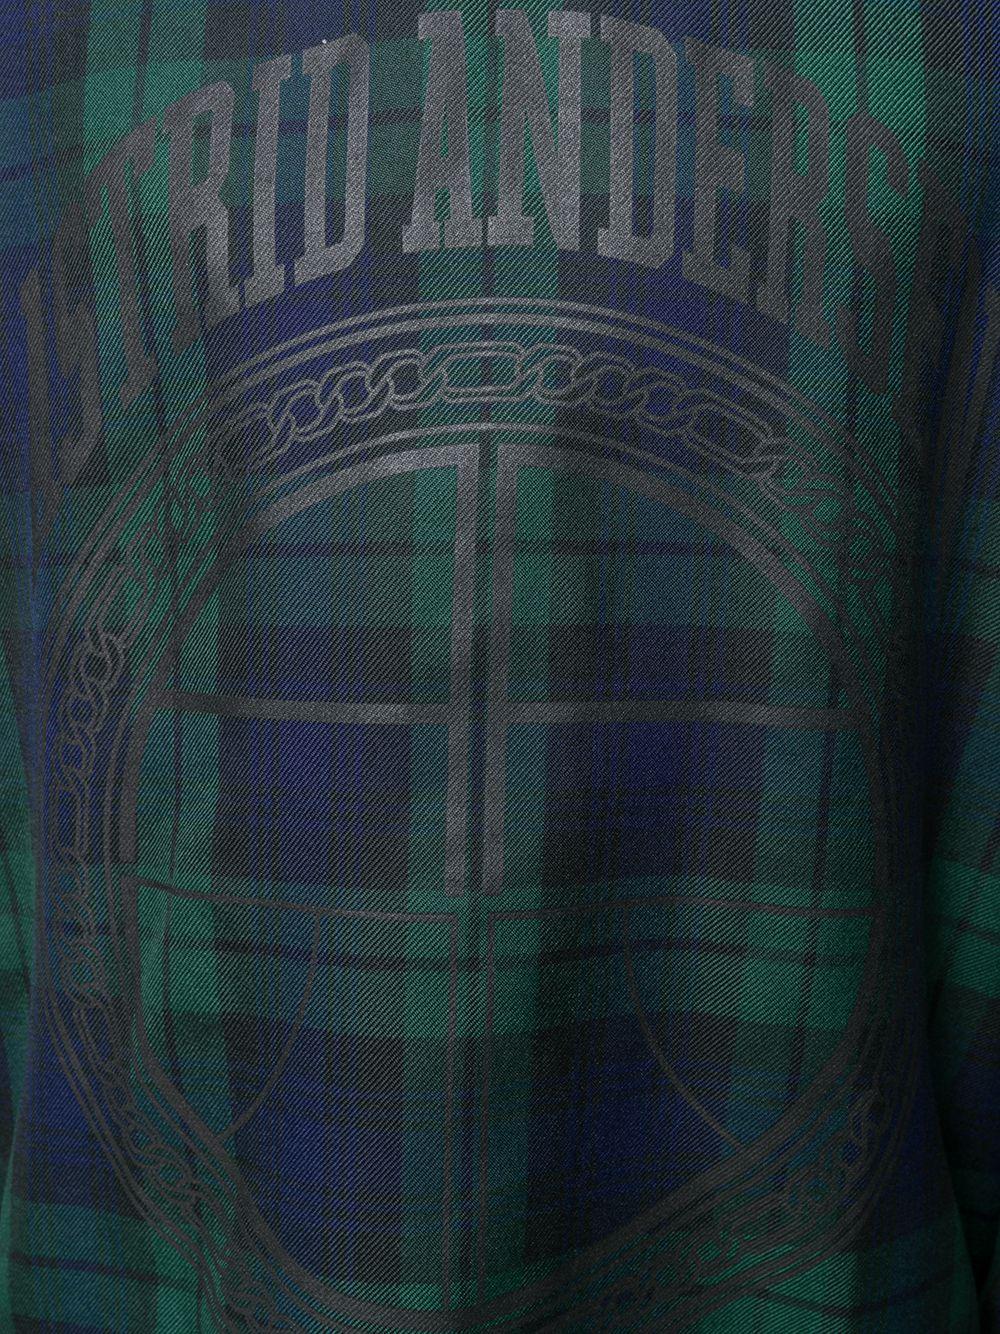 Astrid Andersen   Astrid Andersen толстовка с капюшоном в шотландскую клетку   Clouty